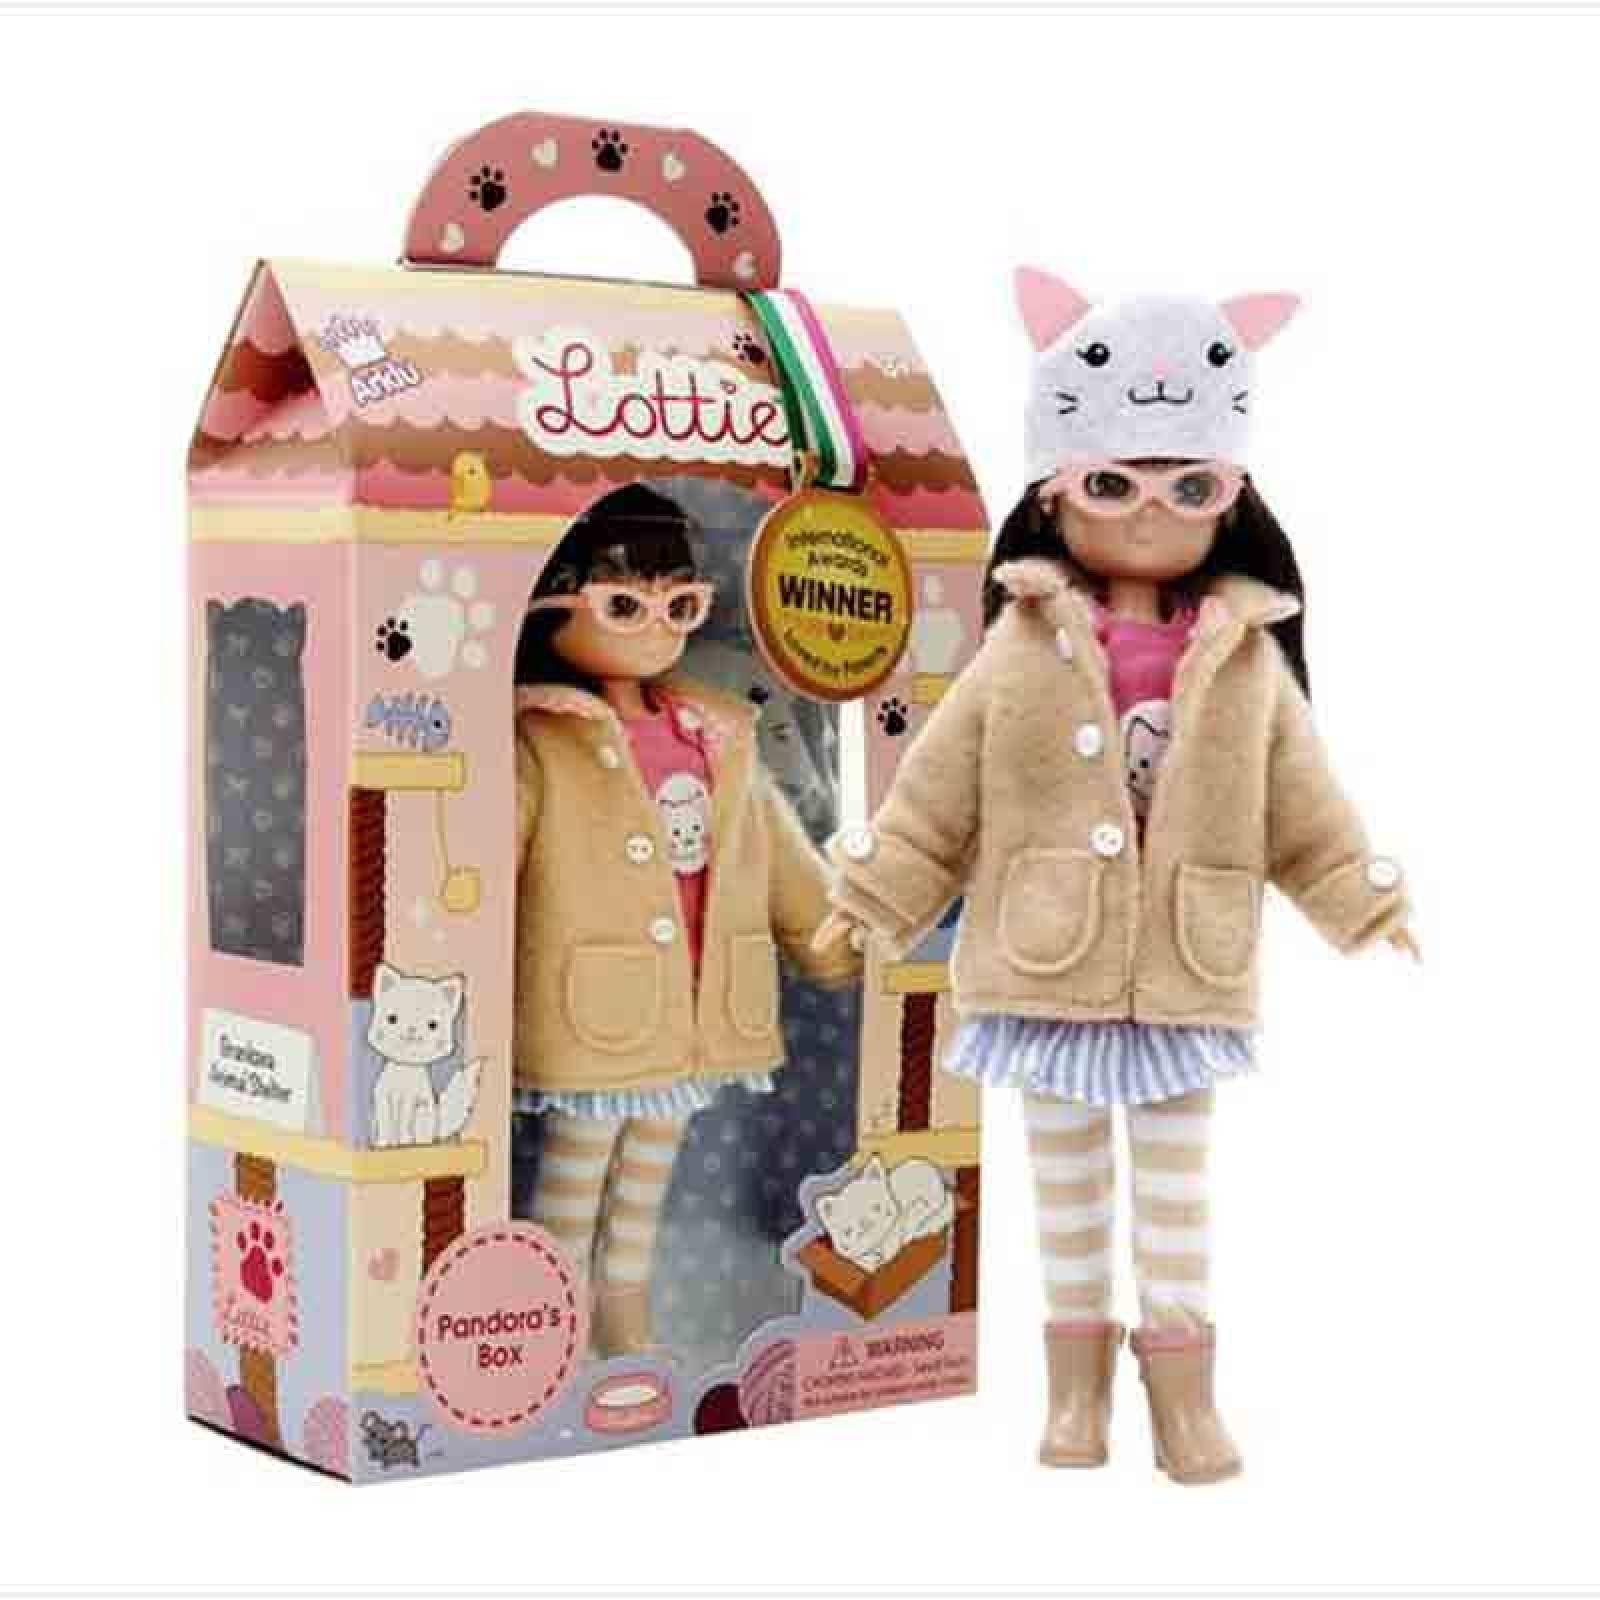 Pandora's Box Lottie Doll 3yr+